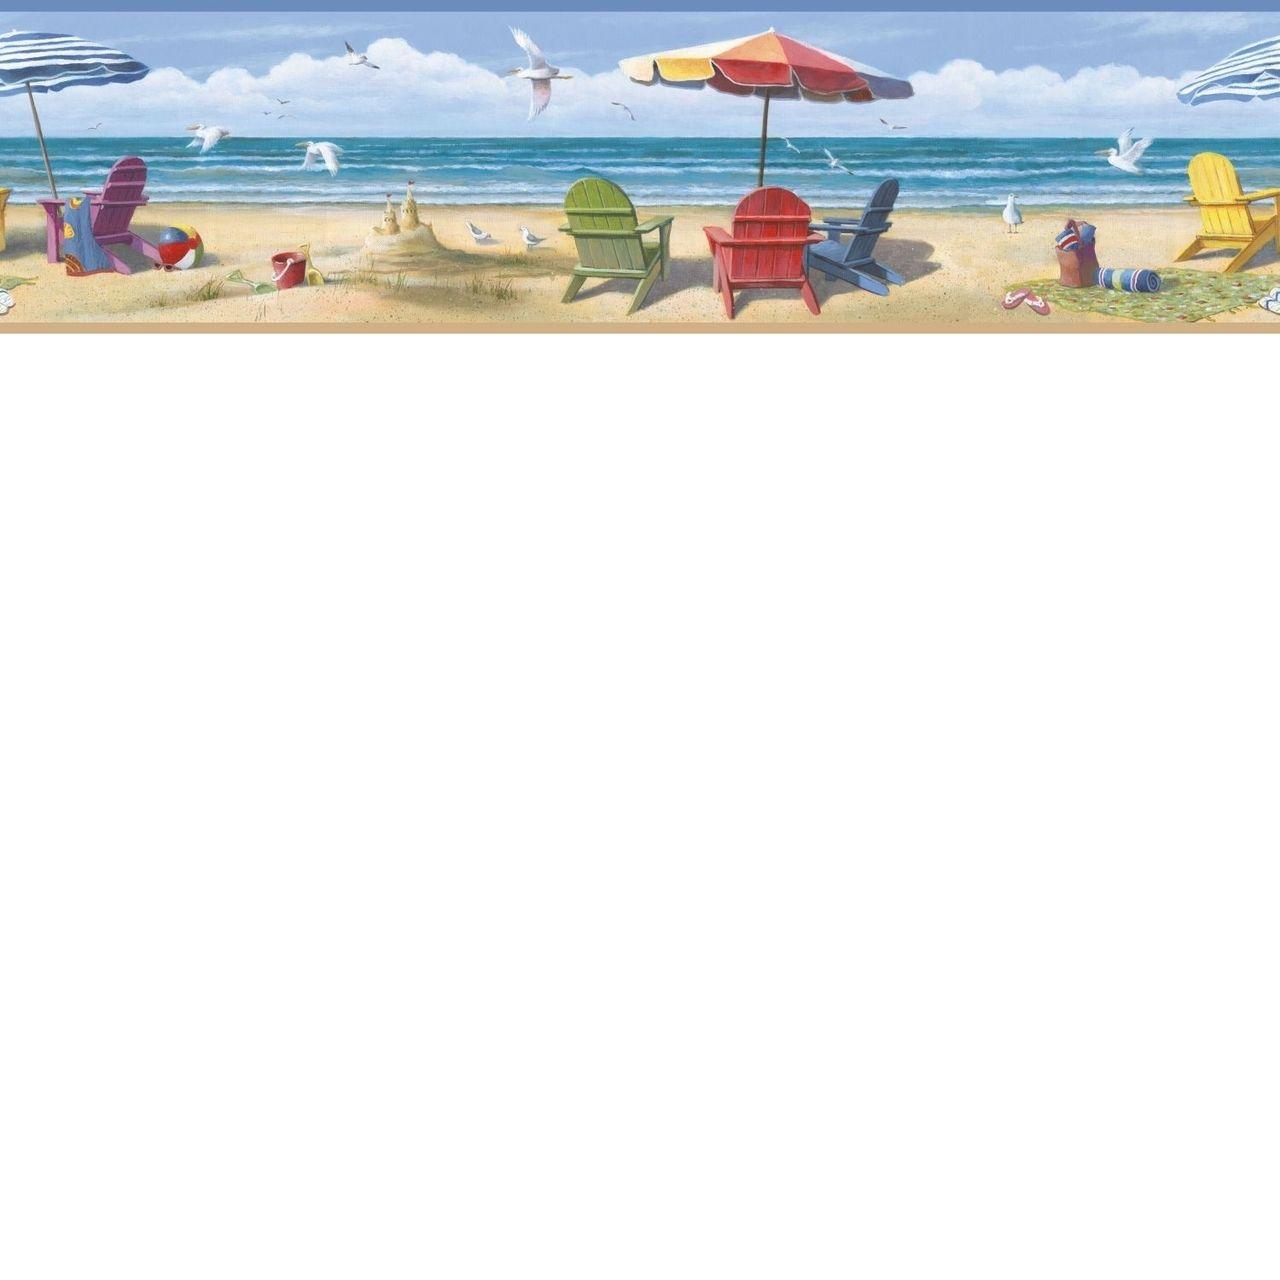 Http Www Papermywalls Com Coastal Waters Volume Ii Beach Sumer At The Beach Wallpaper Border Ct4609 Beach Themed Wallpaper Beach Wallpaper Coastal Wallpaper